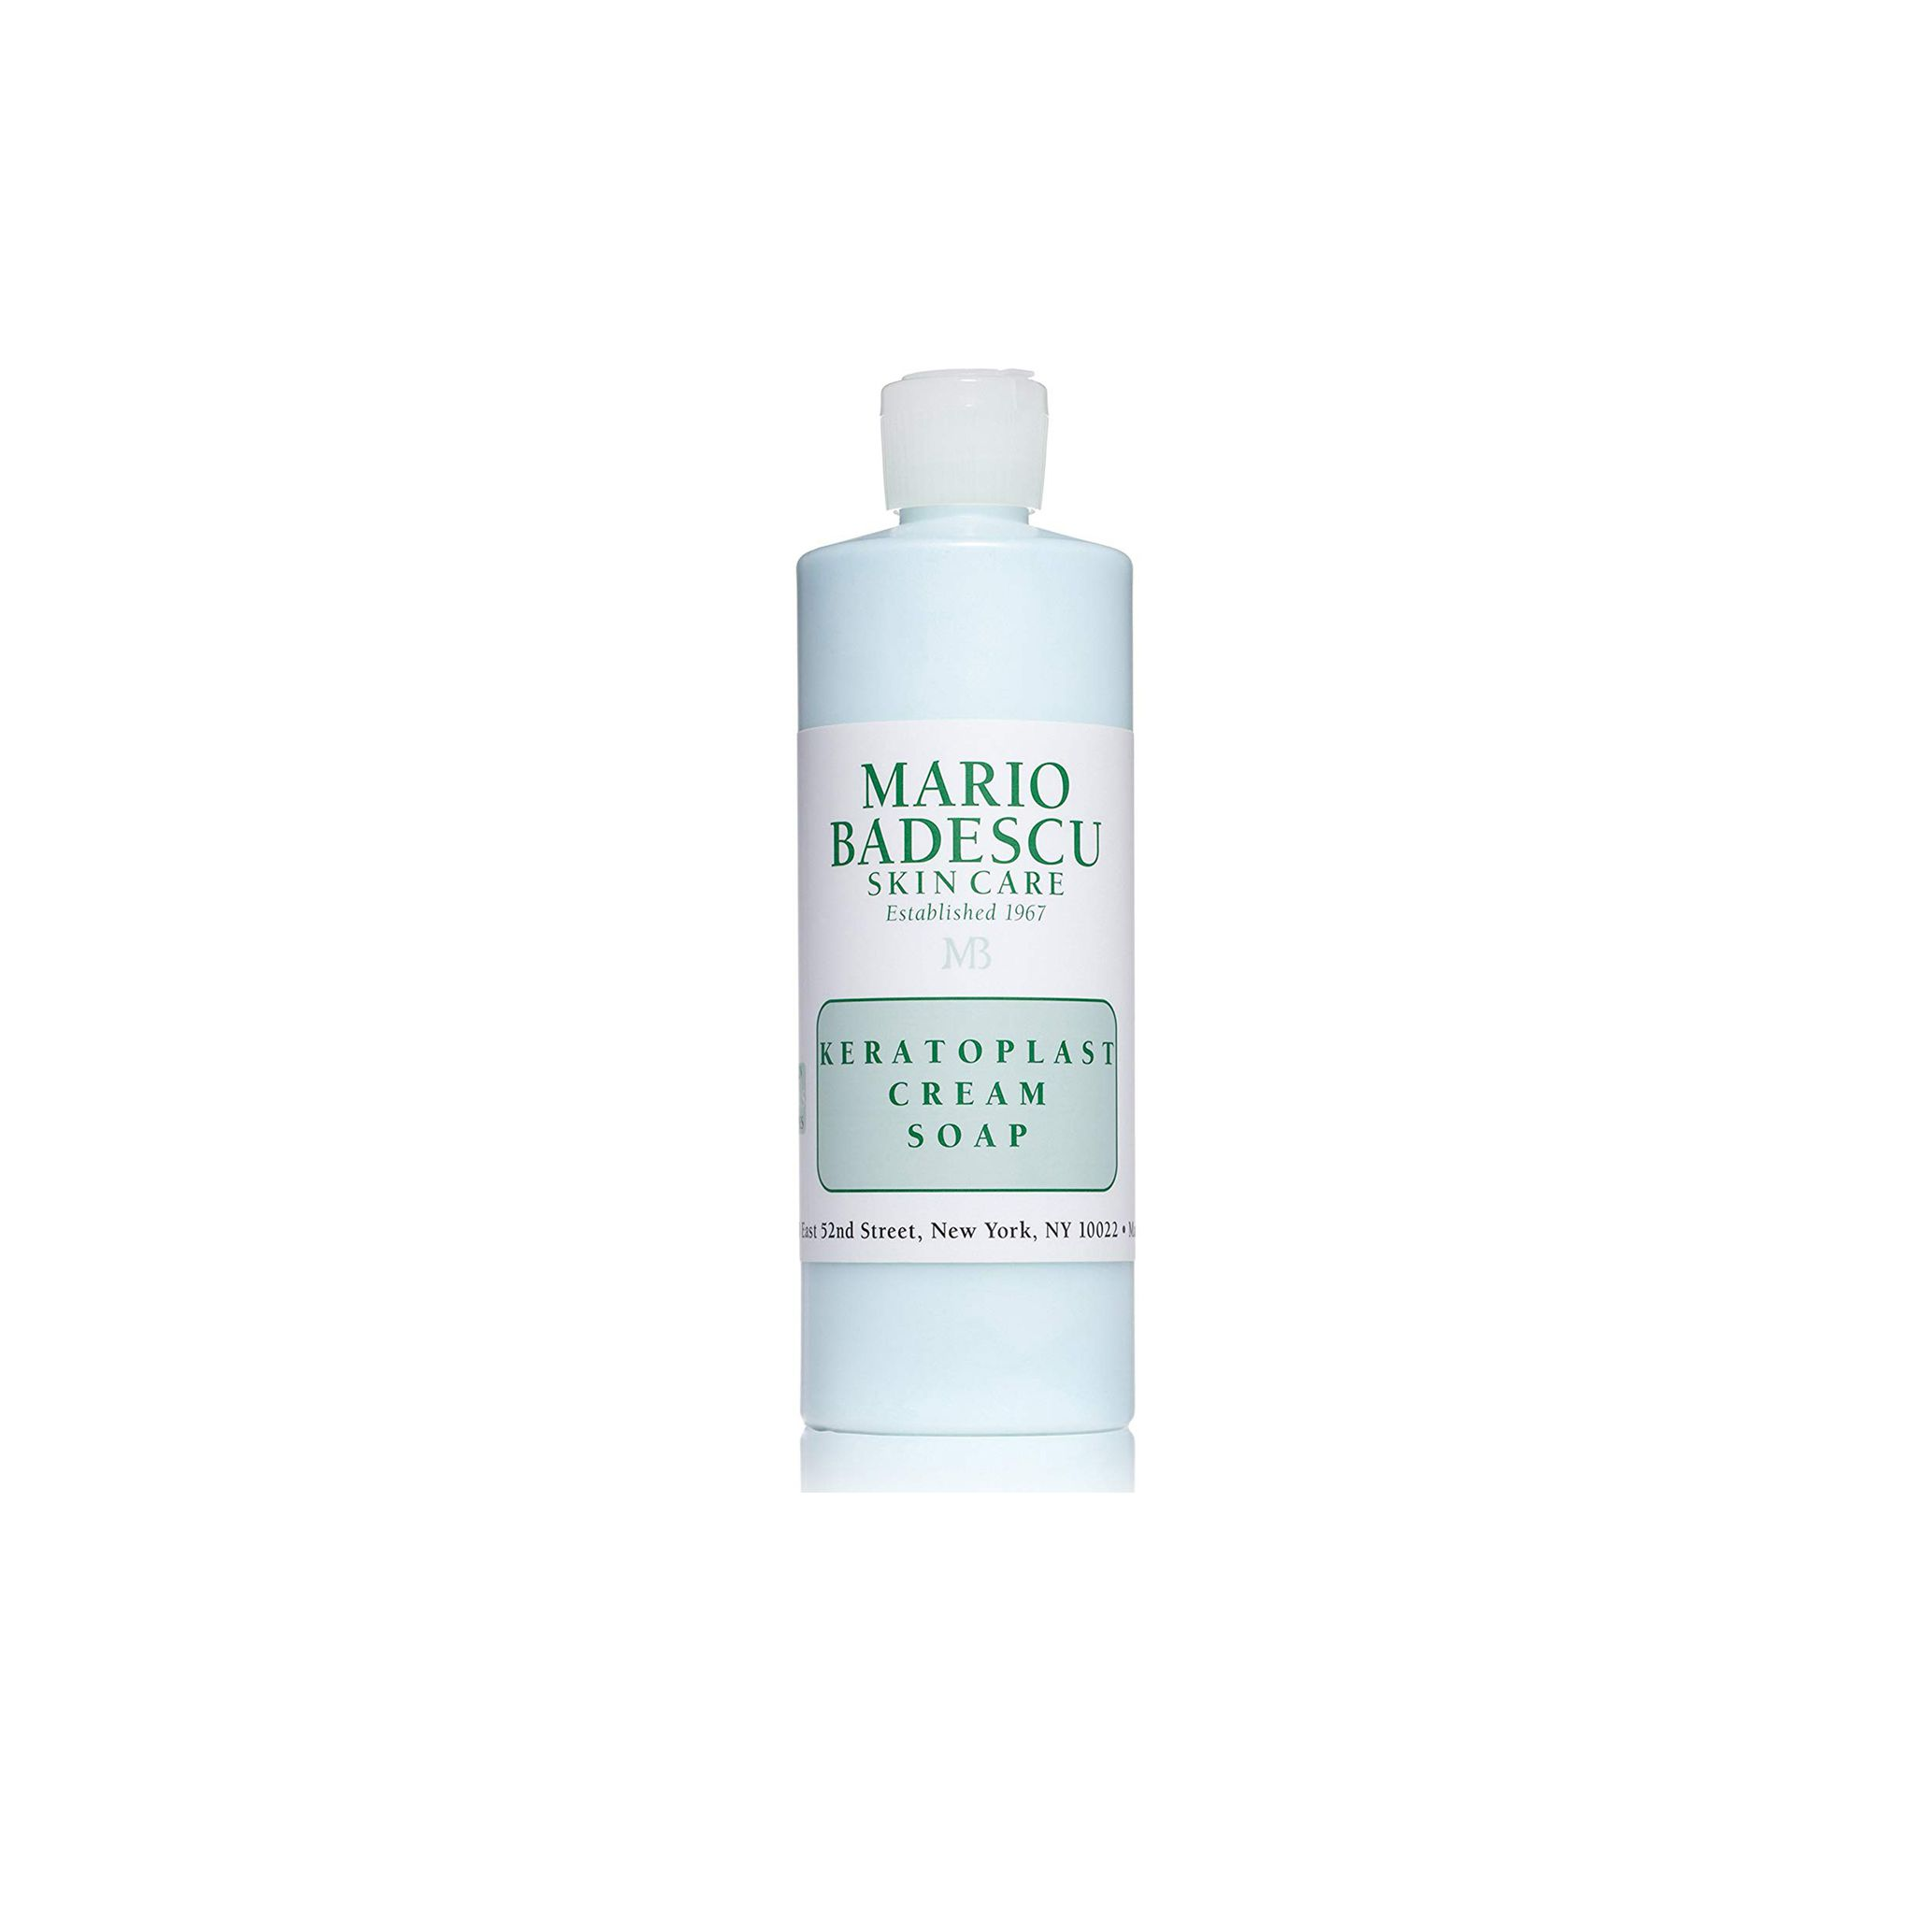 Tube of Mario Badescu Keratoplast Cream Soap